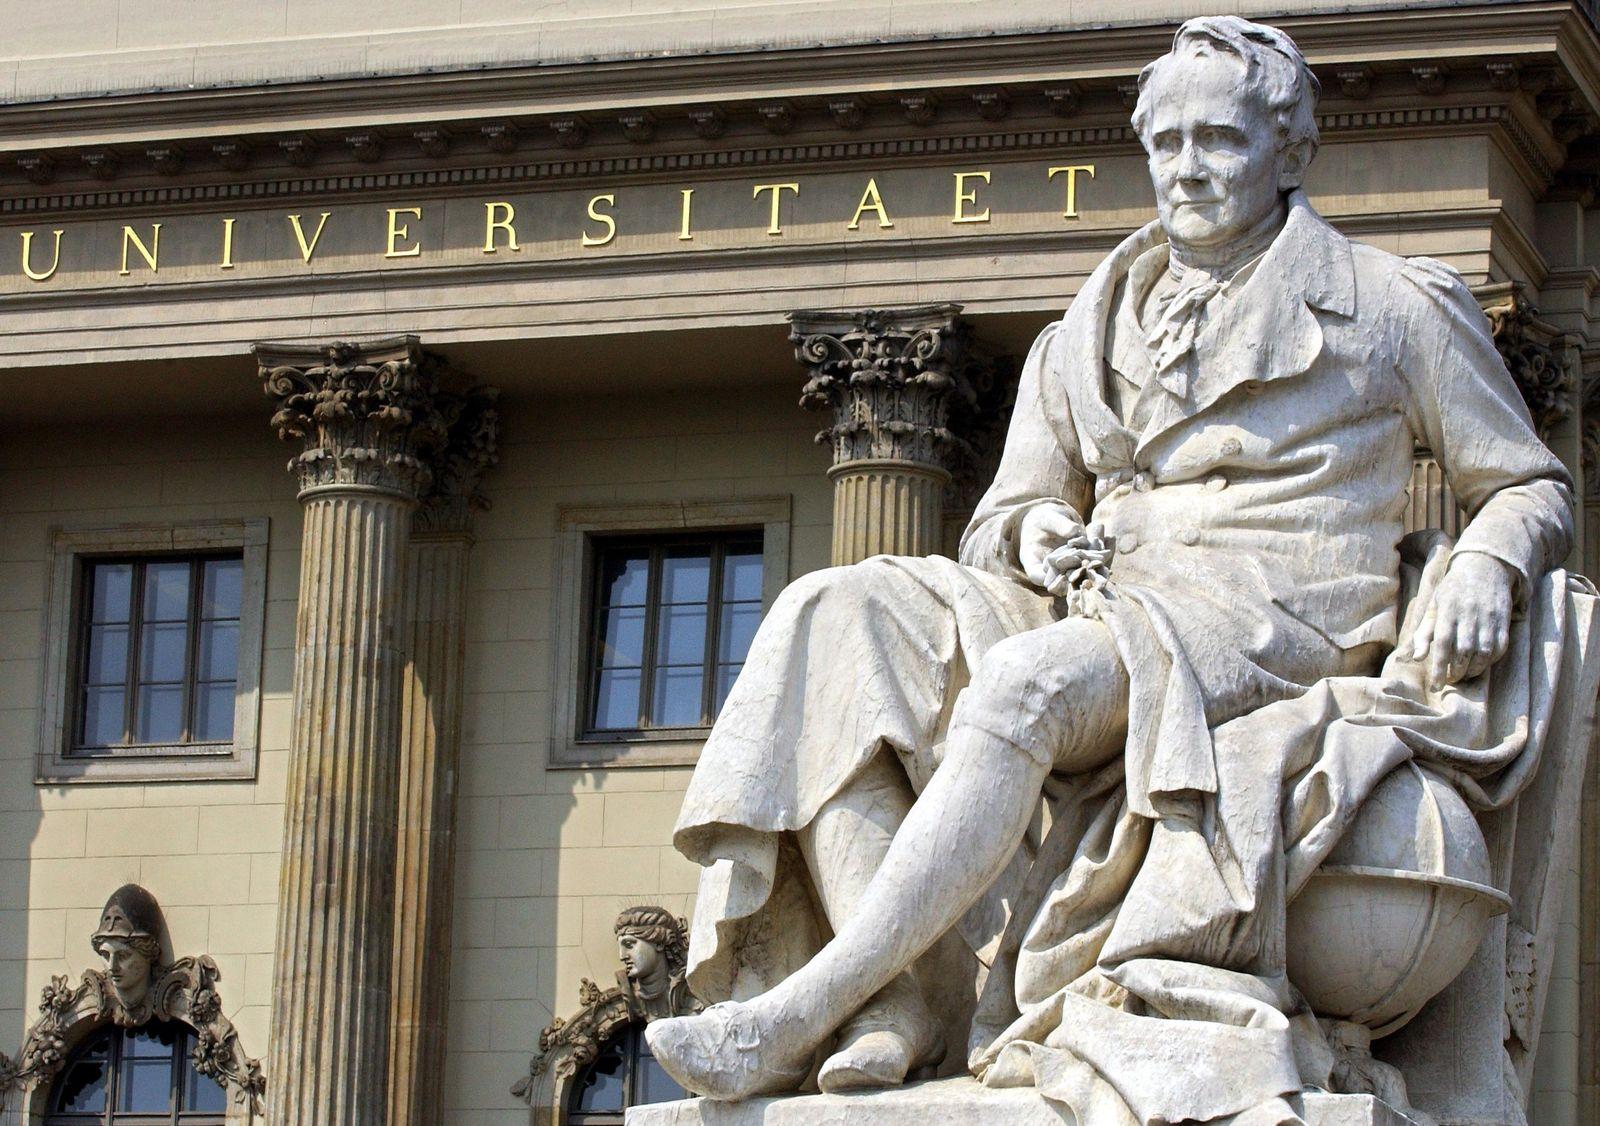 Elite Universität HU Berlin